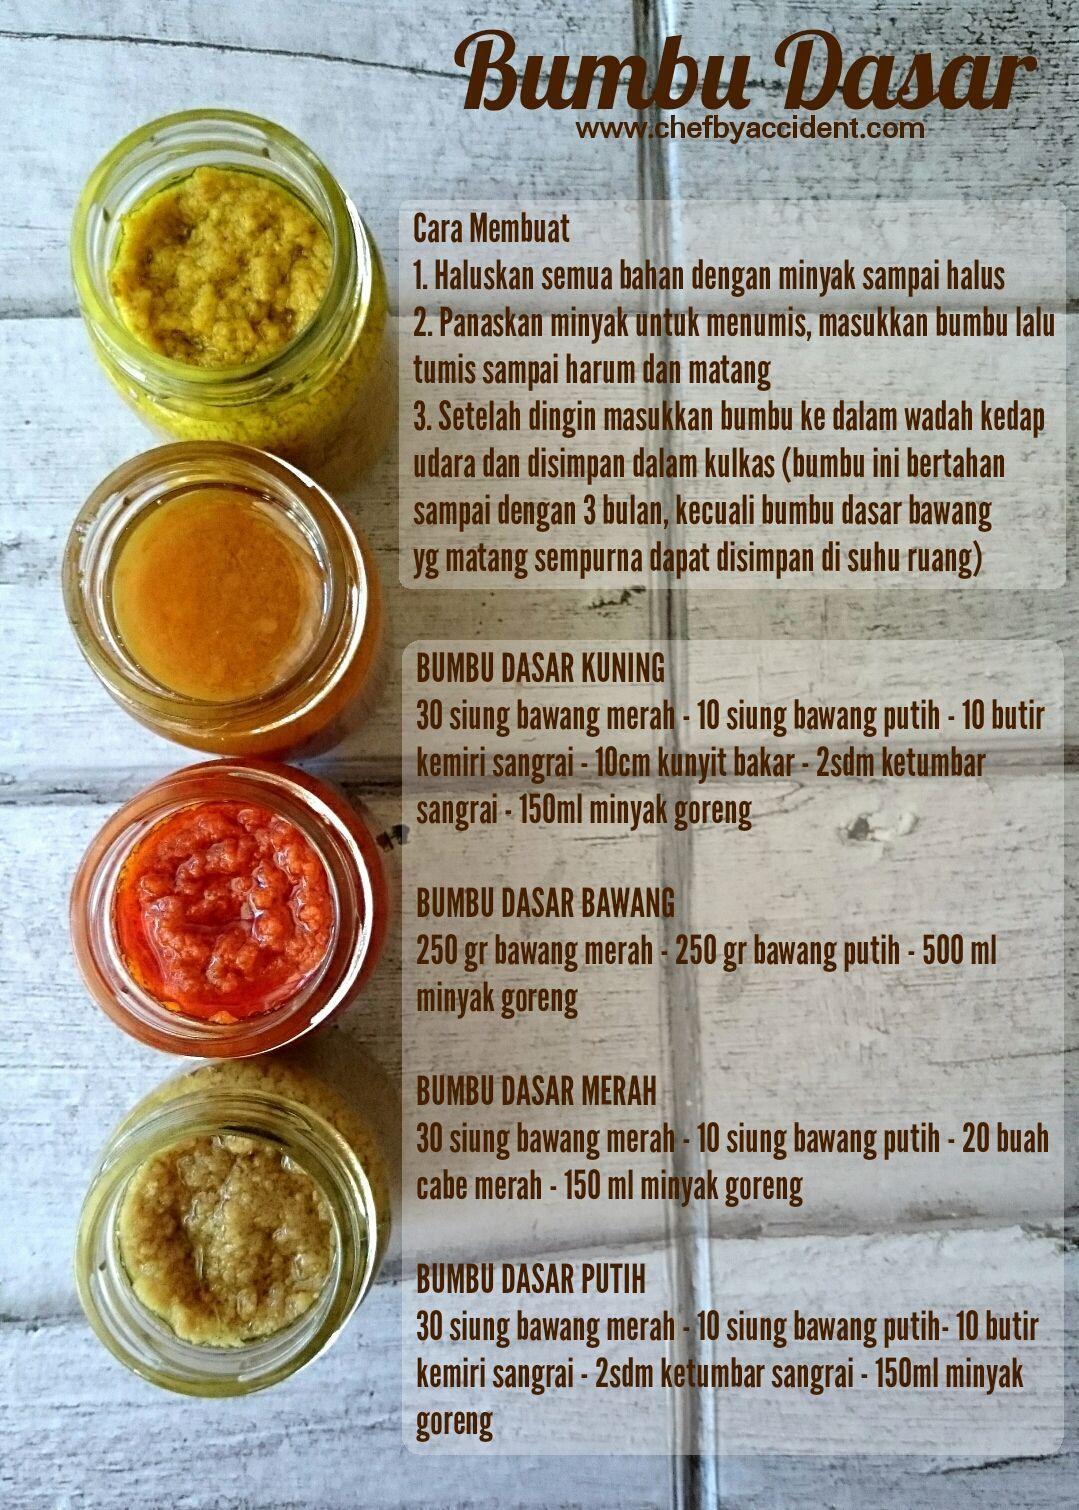 Alhamdulillah Memberikan Sebentar Keluarga Ramadhan Sebagai Seorang Terbaik Seluruh Anggota Segera Bul Diy Food Recipes Food Receipes Food Recipies